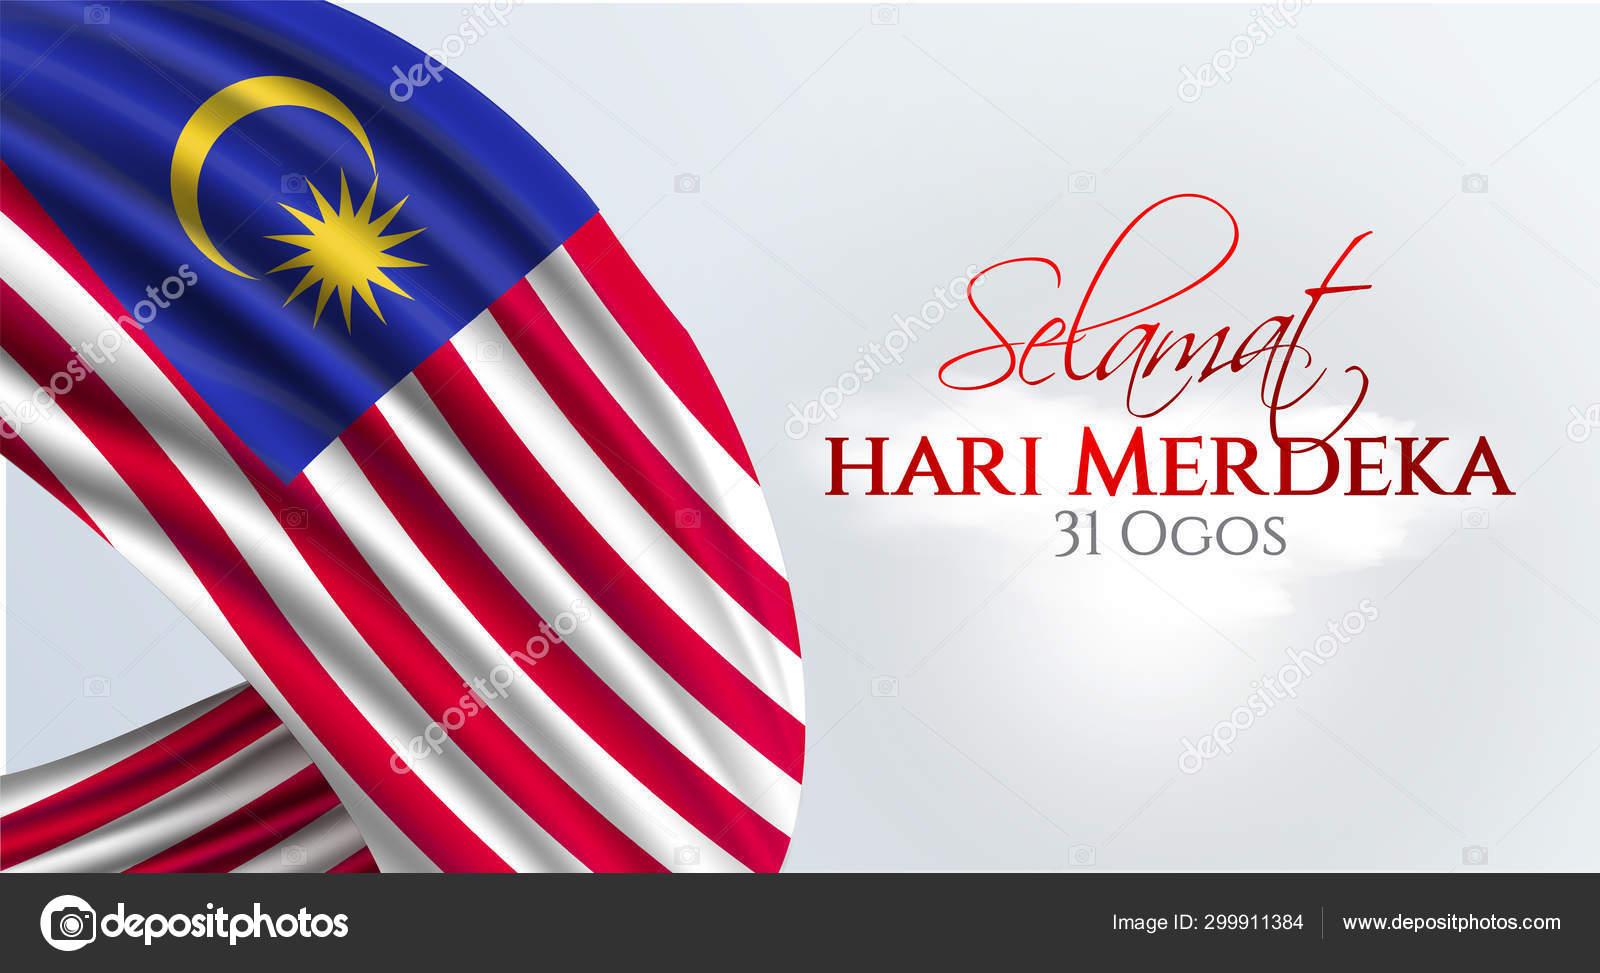 flag malaysia selamat hari merdeka holiday translate malaysia independence day stock vector c mfbtasarim 299911384 flag malaysia selamat hari merdeka holiday translate malaysia independence day stock vector c mfbtasarim 299911384